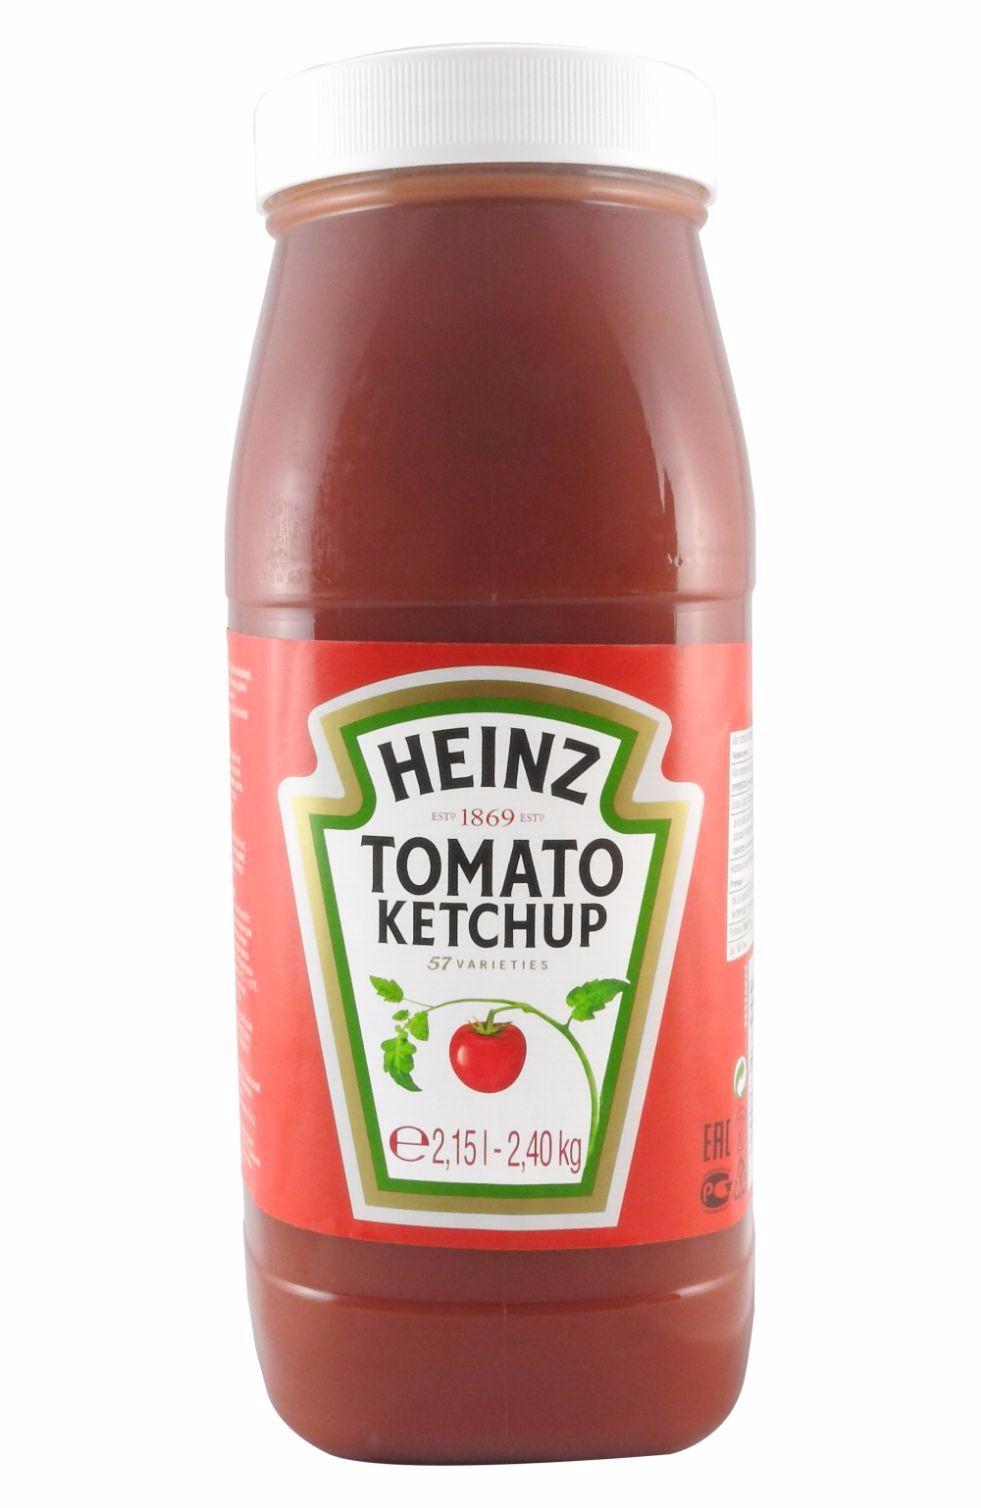 Heinz Tomato Ketchup 10.2L Bidon image